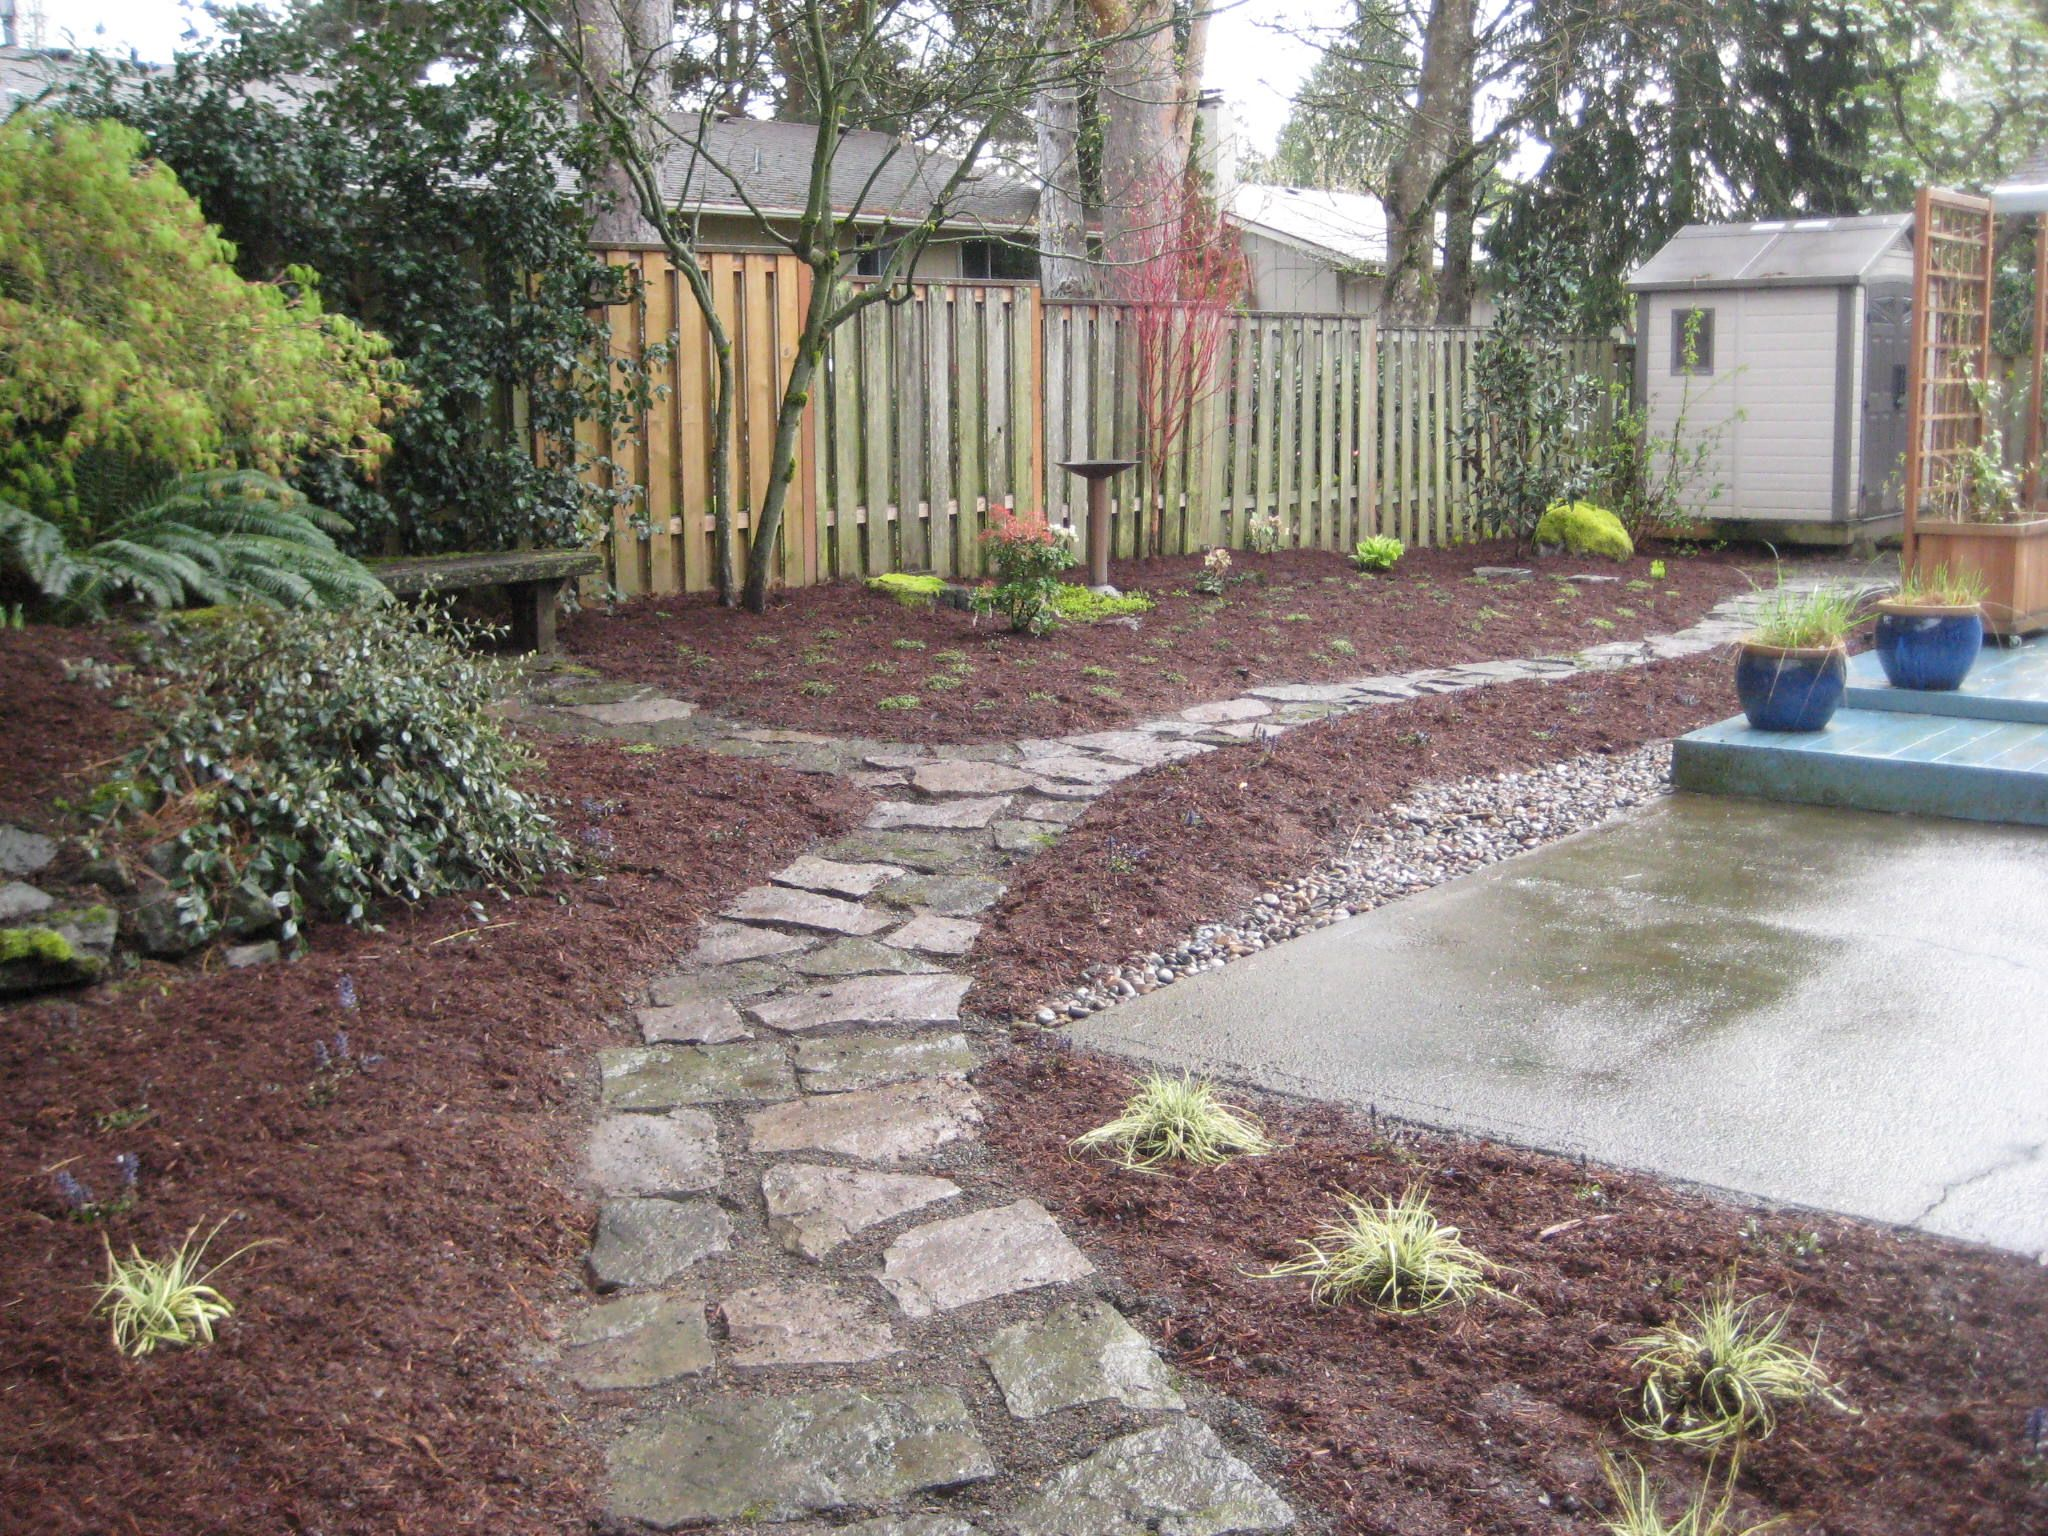 Backyard Ideas Without Grass For Dogs Thorplc Com No Grass